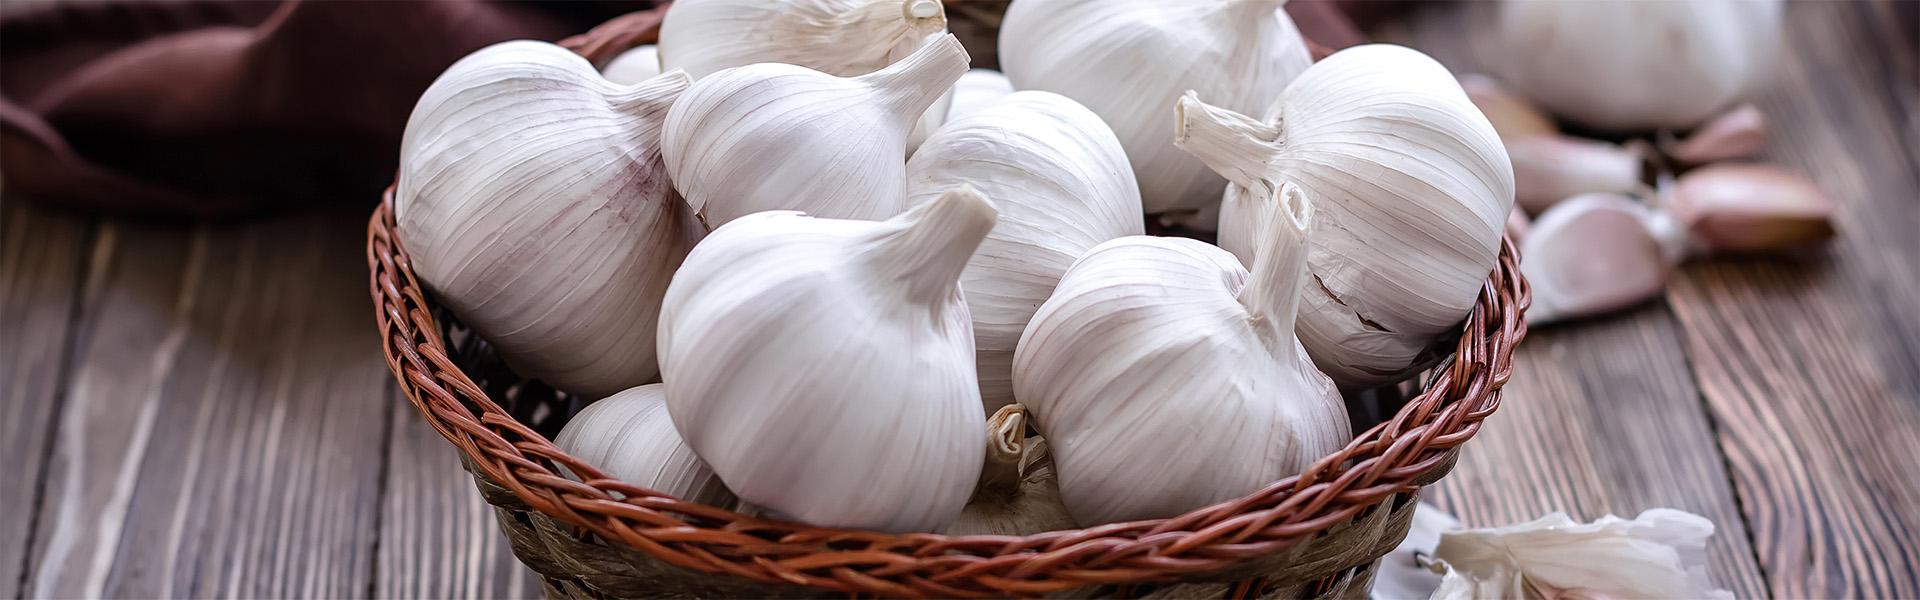 "<p data-aos=fade-up style=""text-align:center""><strong>Czech garlic</strong></p>"